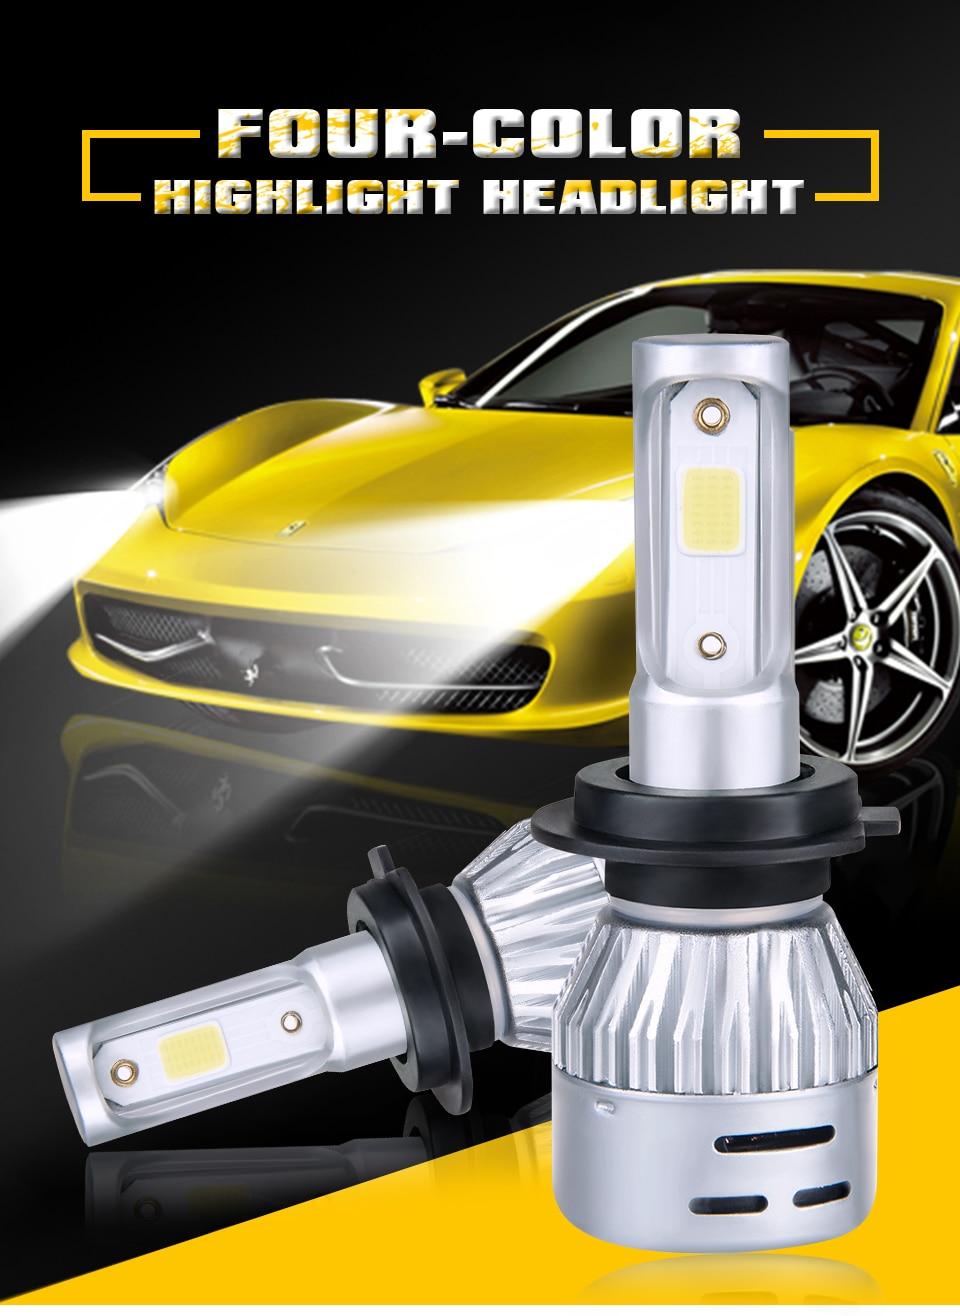 Aceersun H4 LED H7 Car Headlight H1 H8 H9 9005 9006 8000lm 4300K 6500K MINI 72W Auto Hi Lo Beam 12V And 5V USB Small stage light (1)